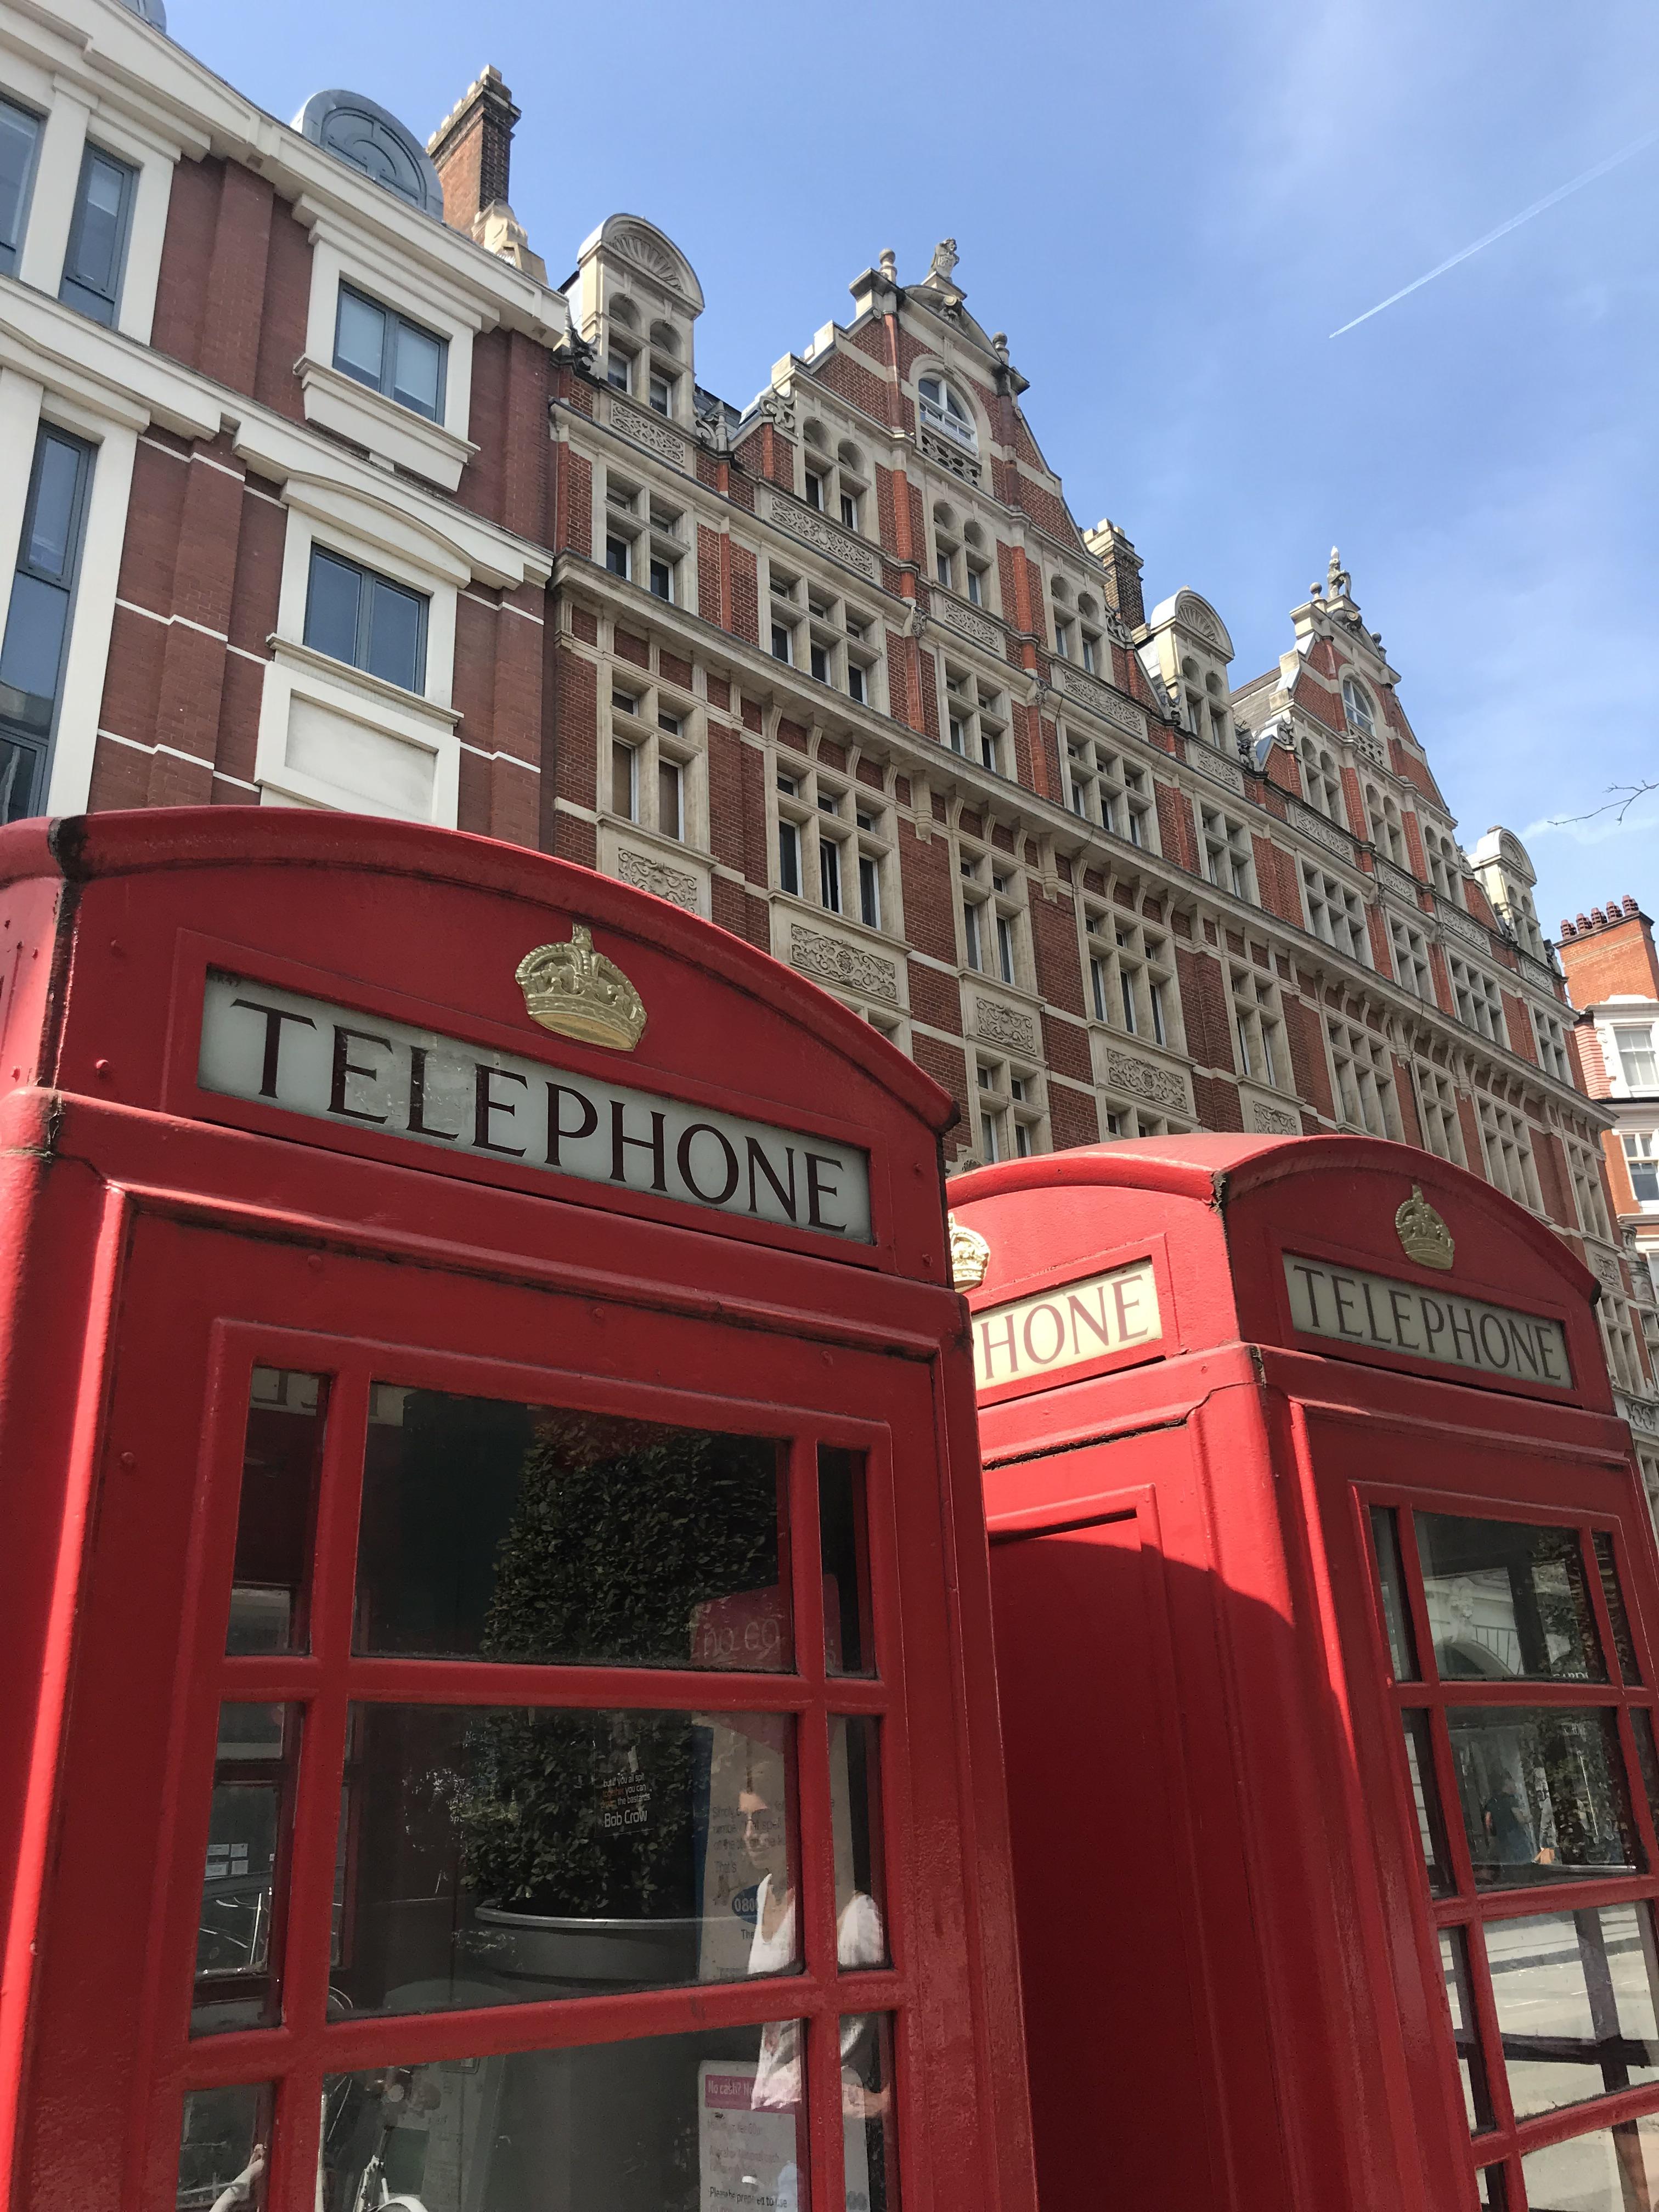 cabine-telefoniche-rosse-londra